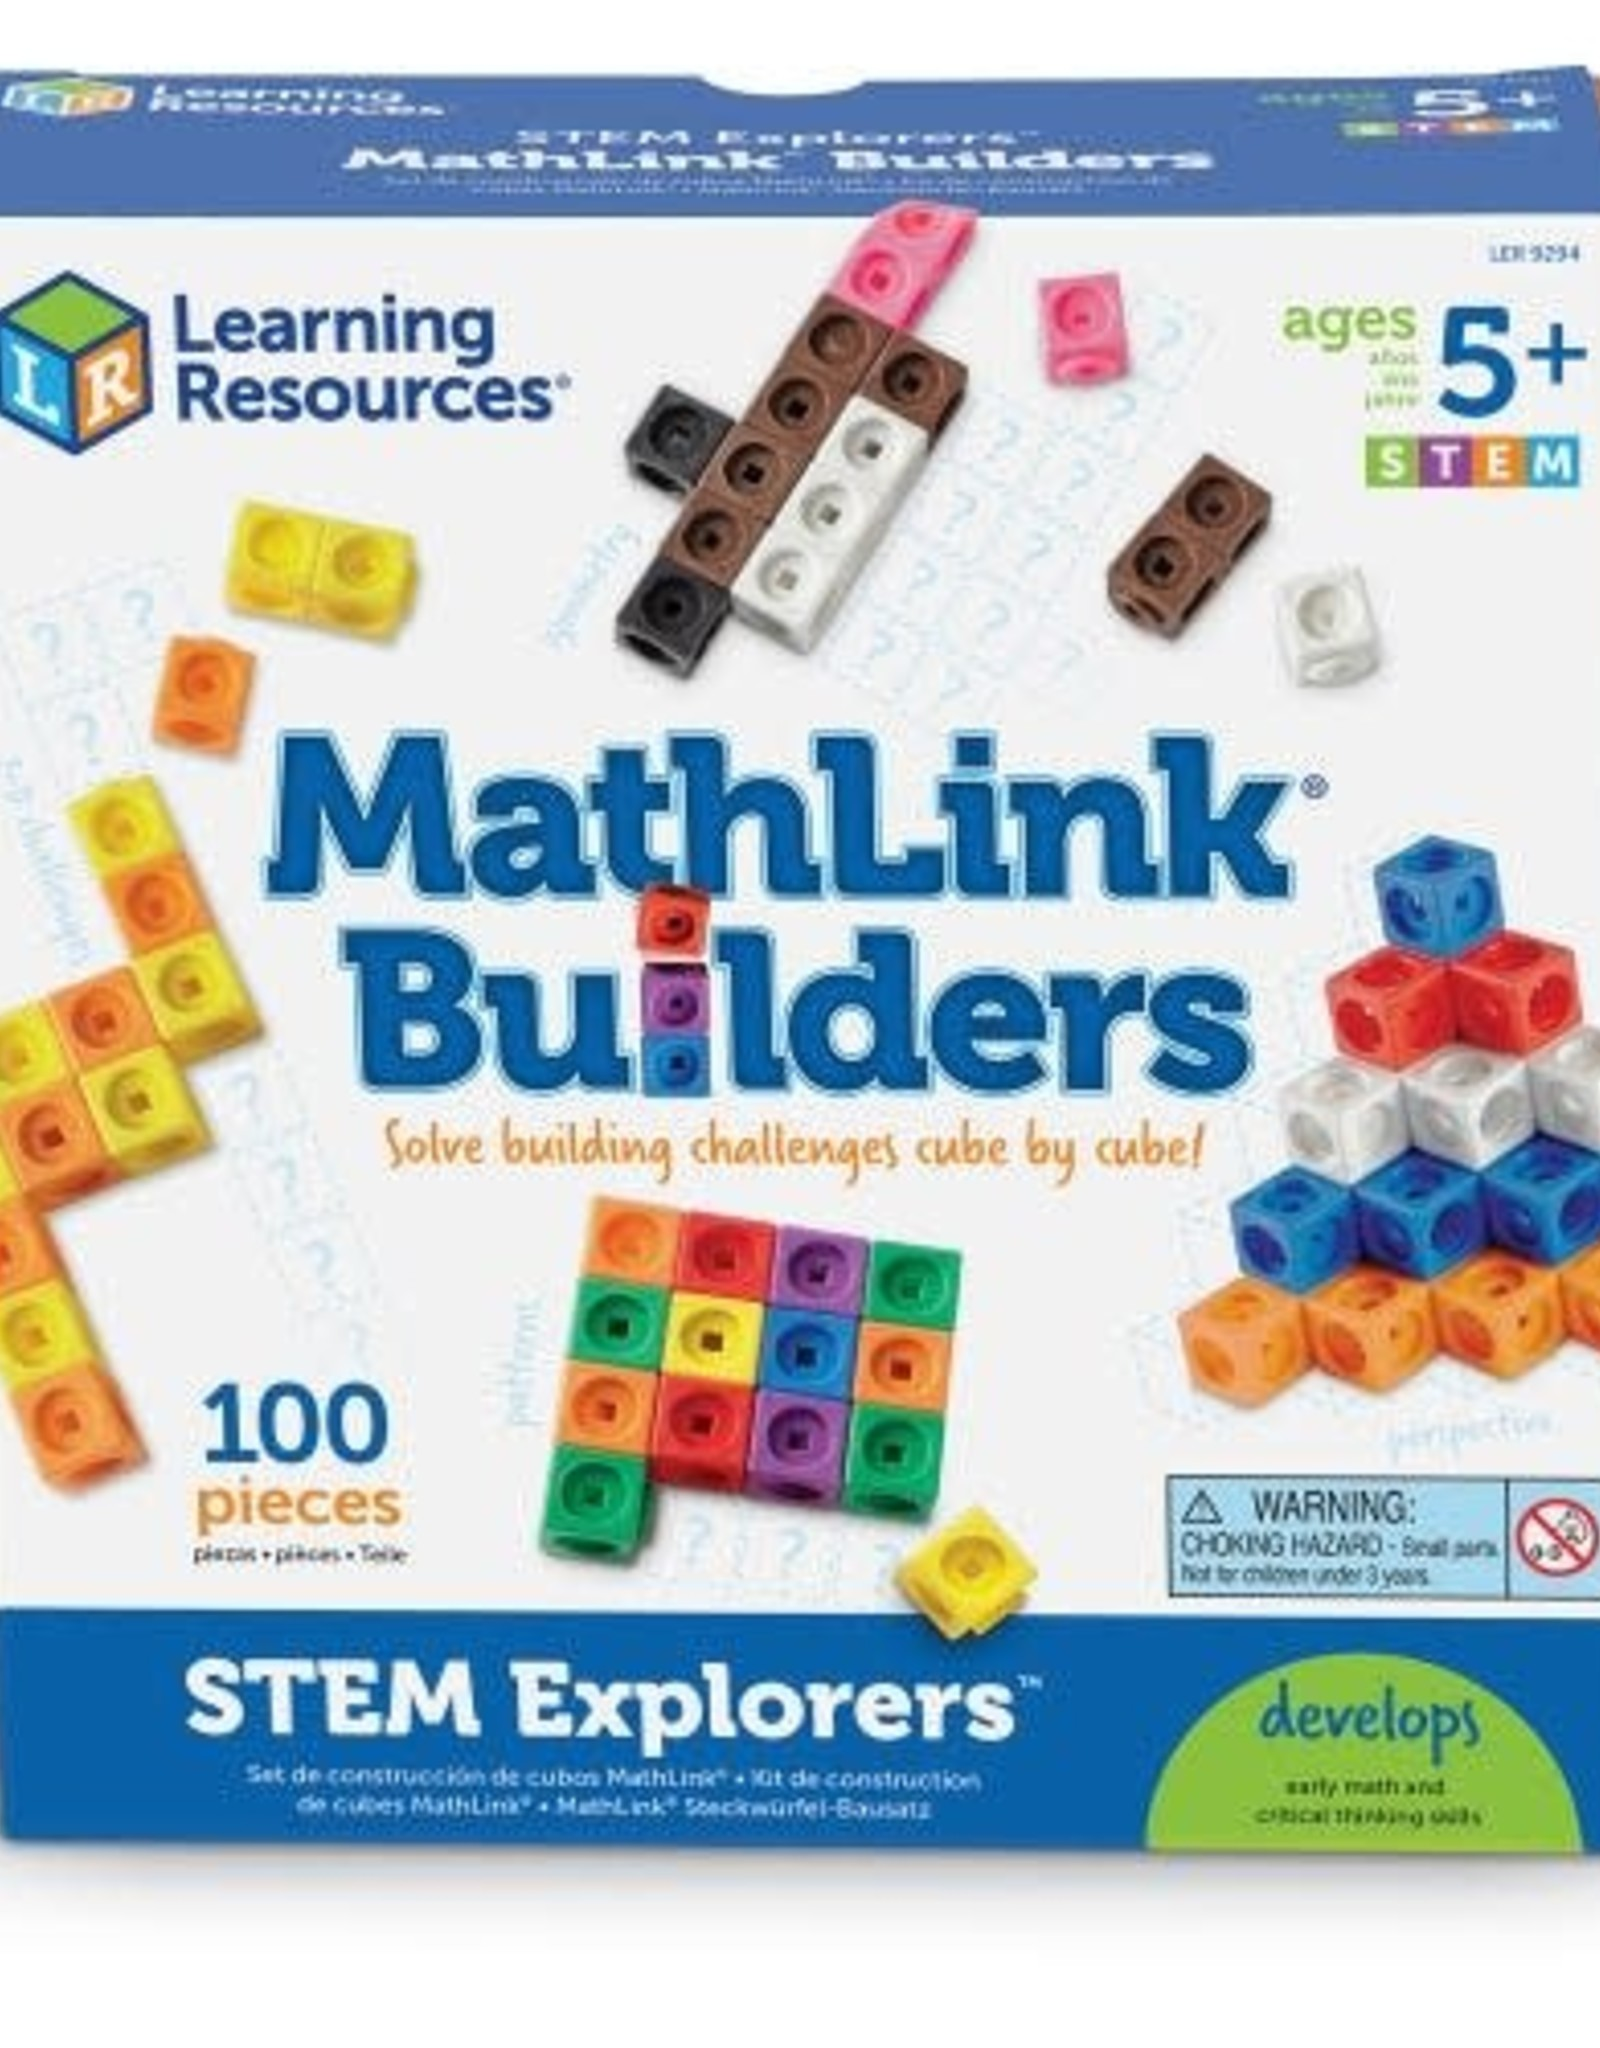 Learning Resources STEM Explorers Mathlink Builders